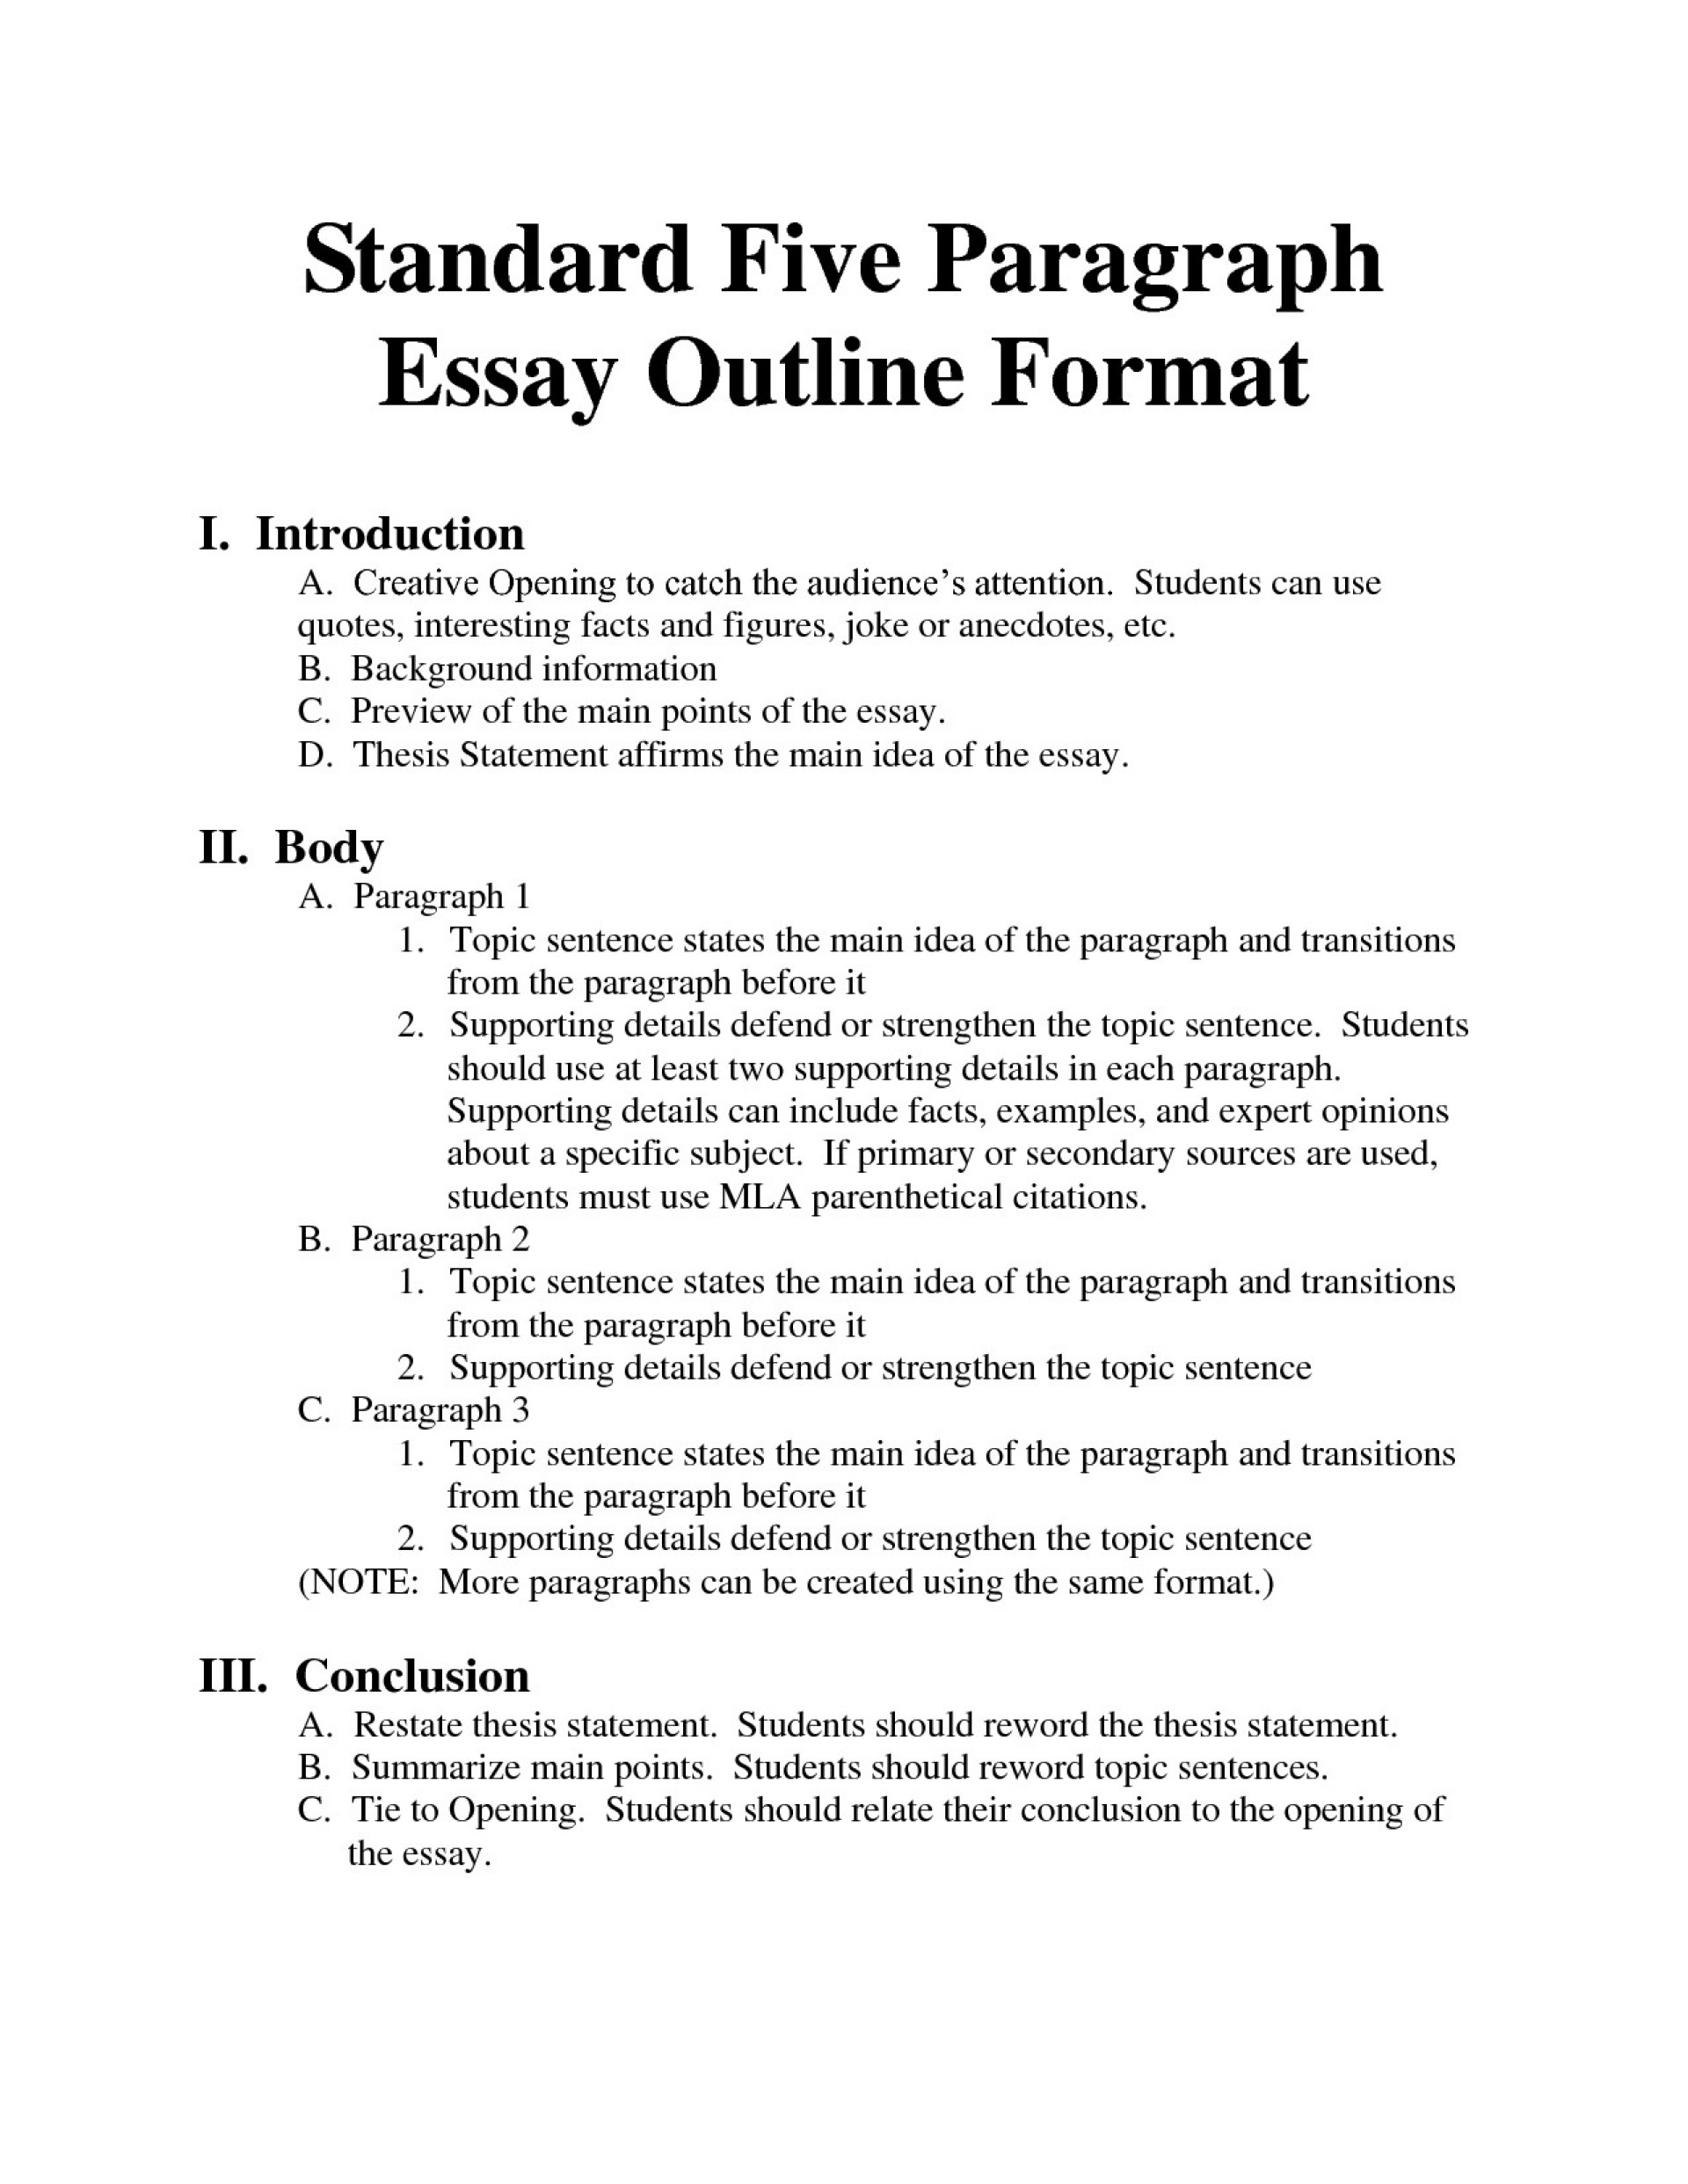 017 Personal Essay Format Writing Types Of Standard Bing Essays Homeschool Formidable Narrative For Scholarships Samples Graduate School 1920